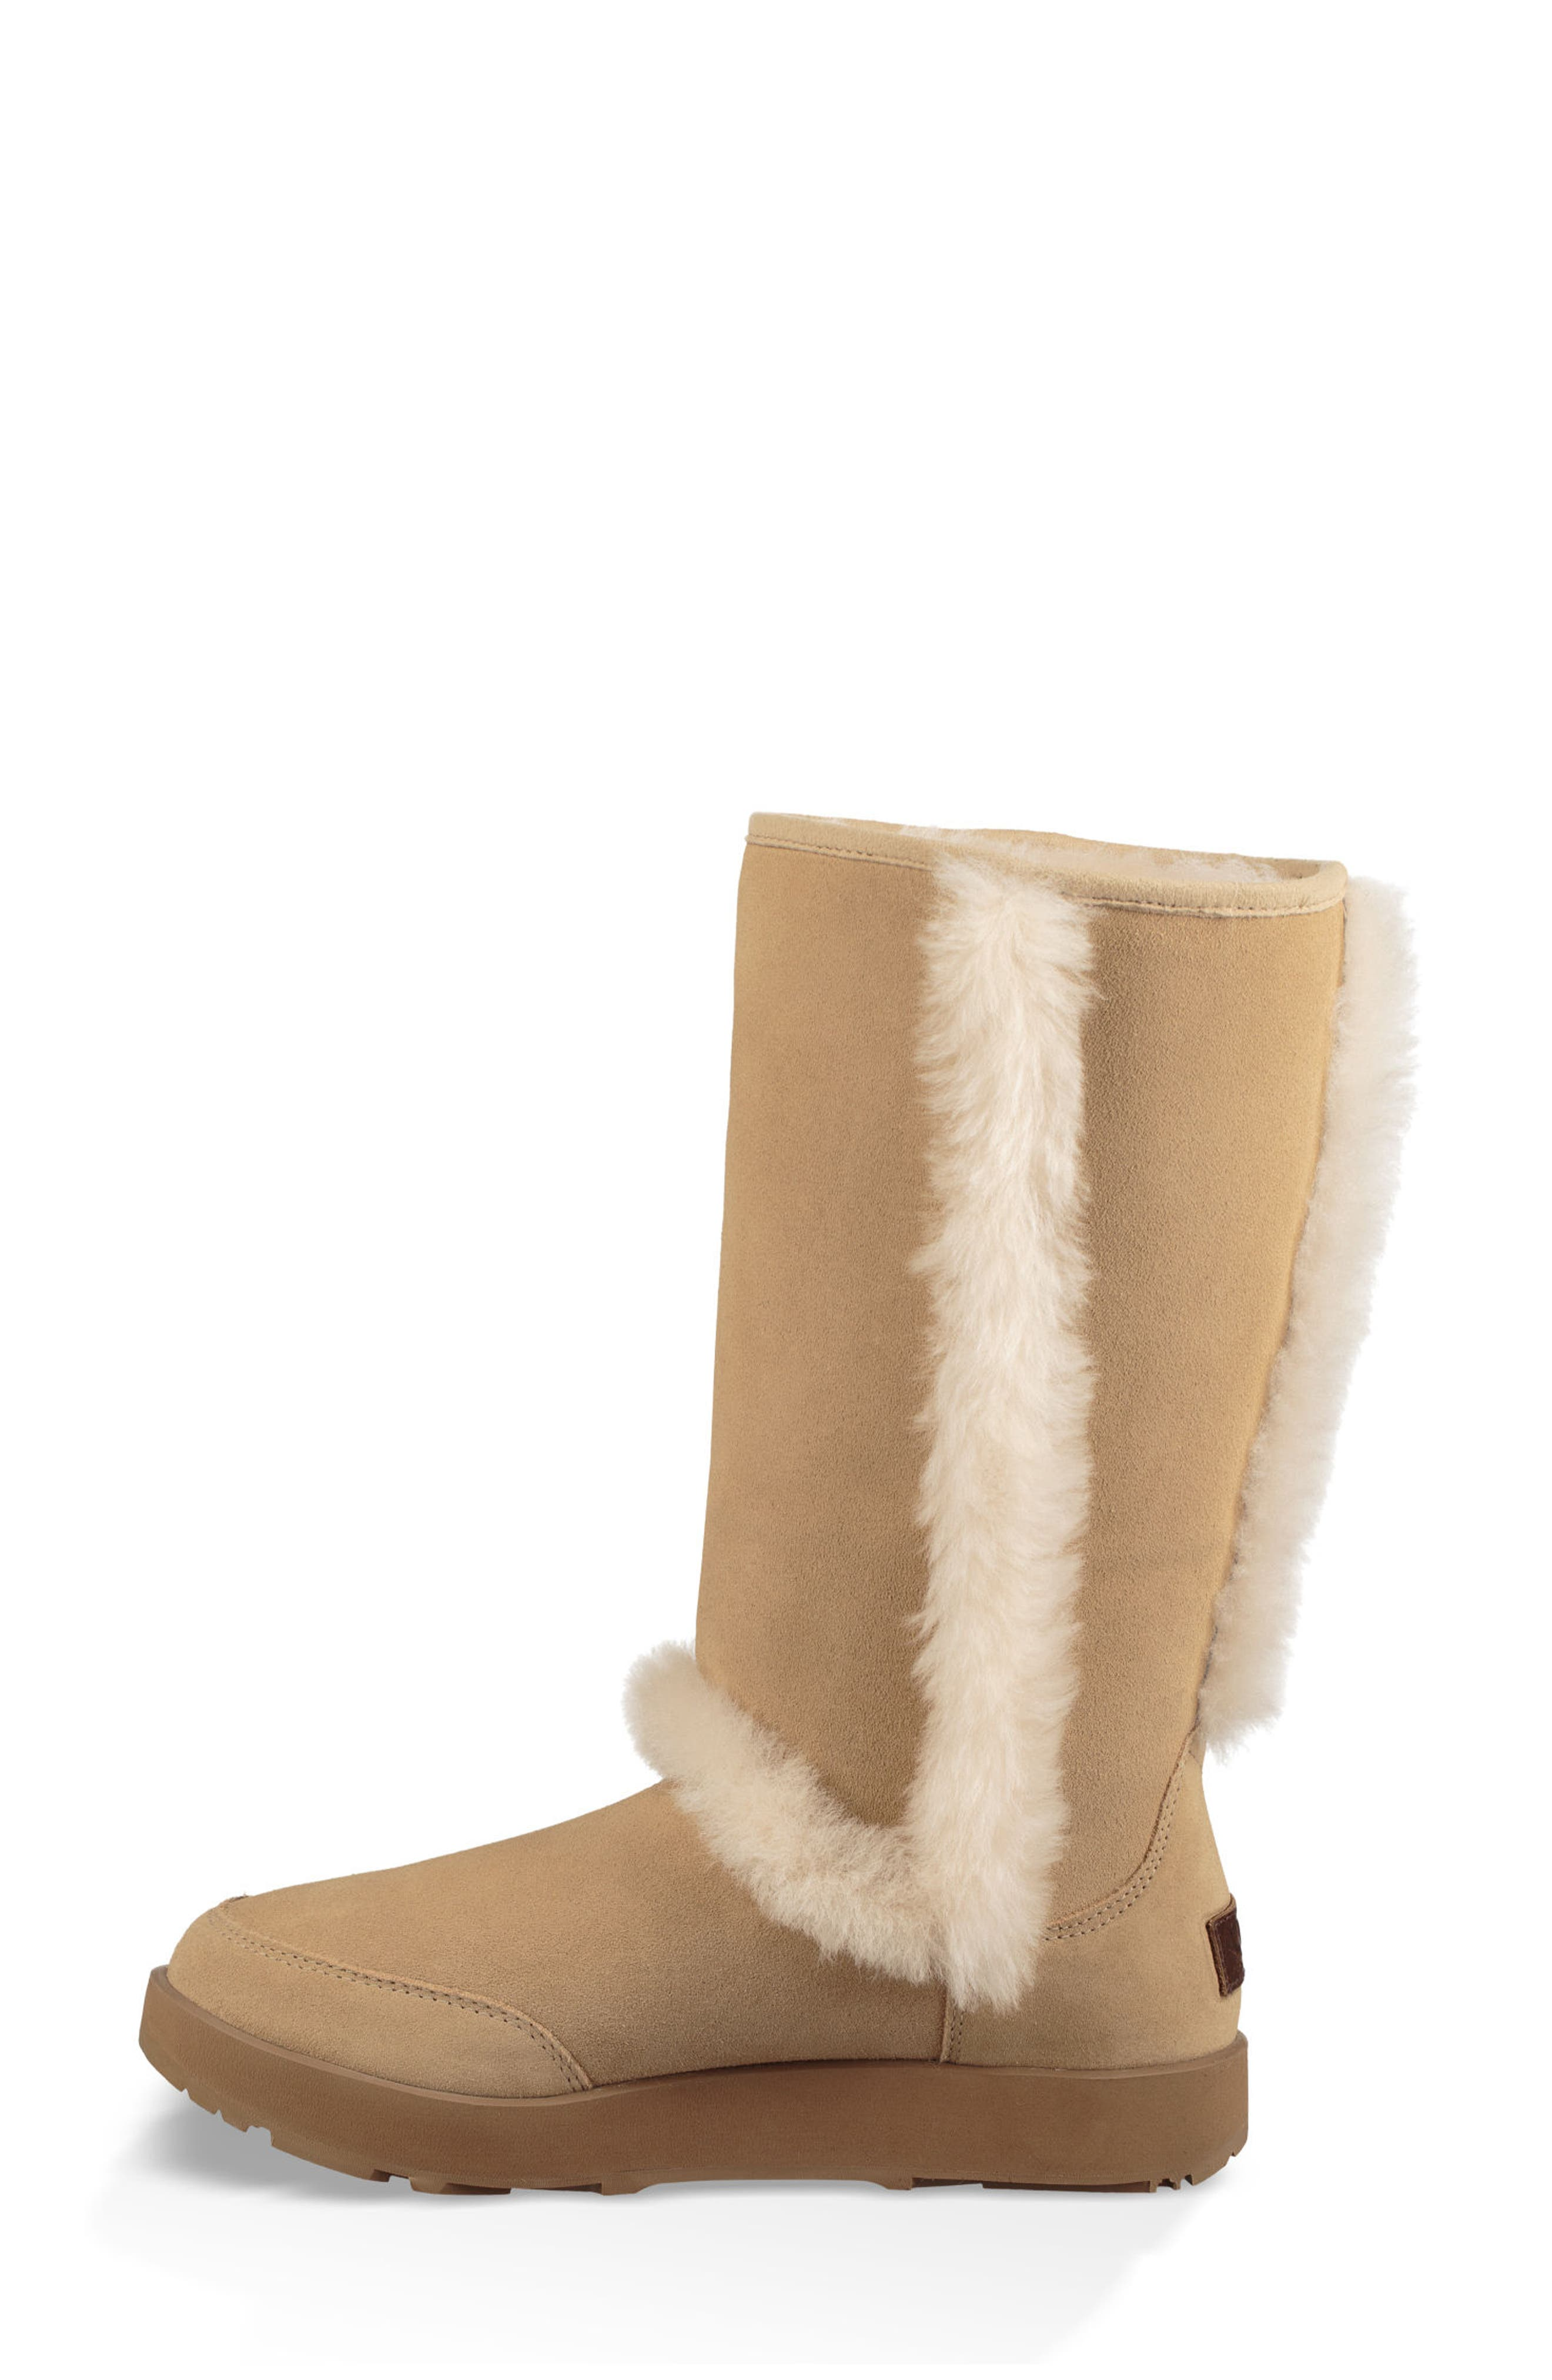 Sundance Genuine Shearling Waterproof Boot,                             Alternate thumbnail 3, color,                             Sand Suede